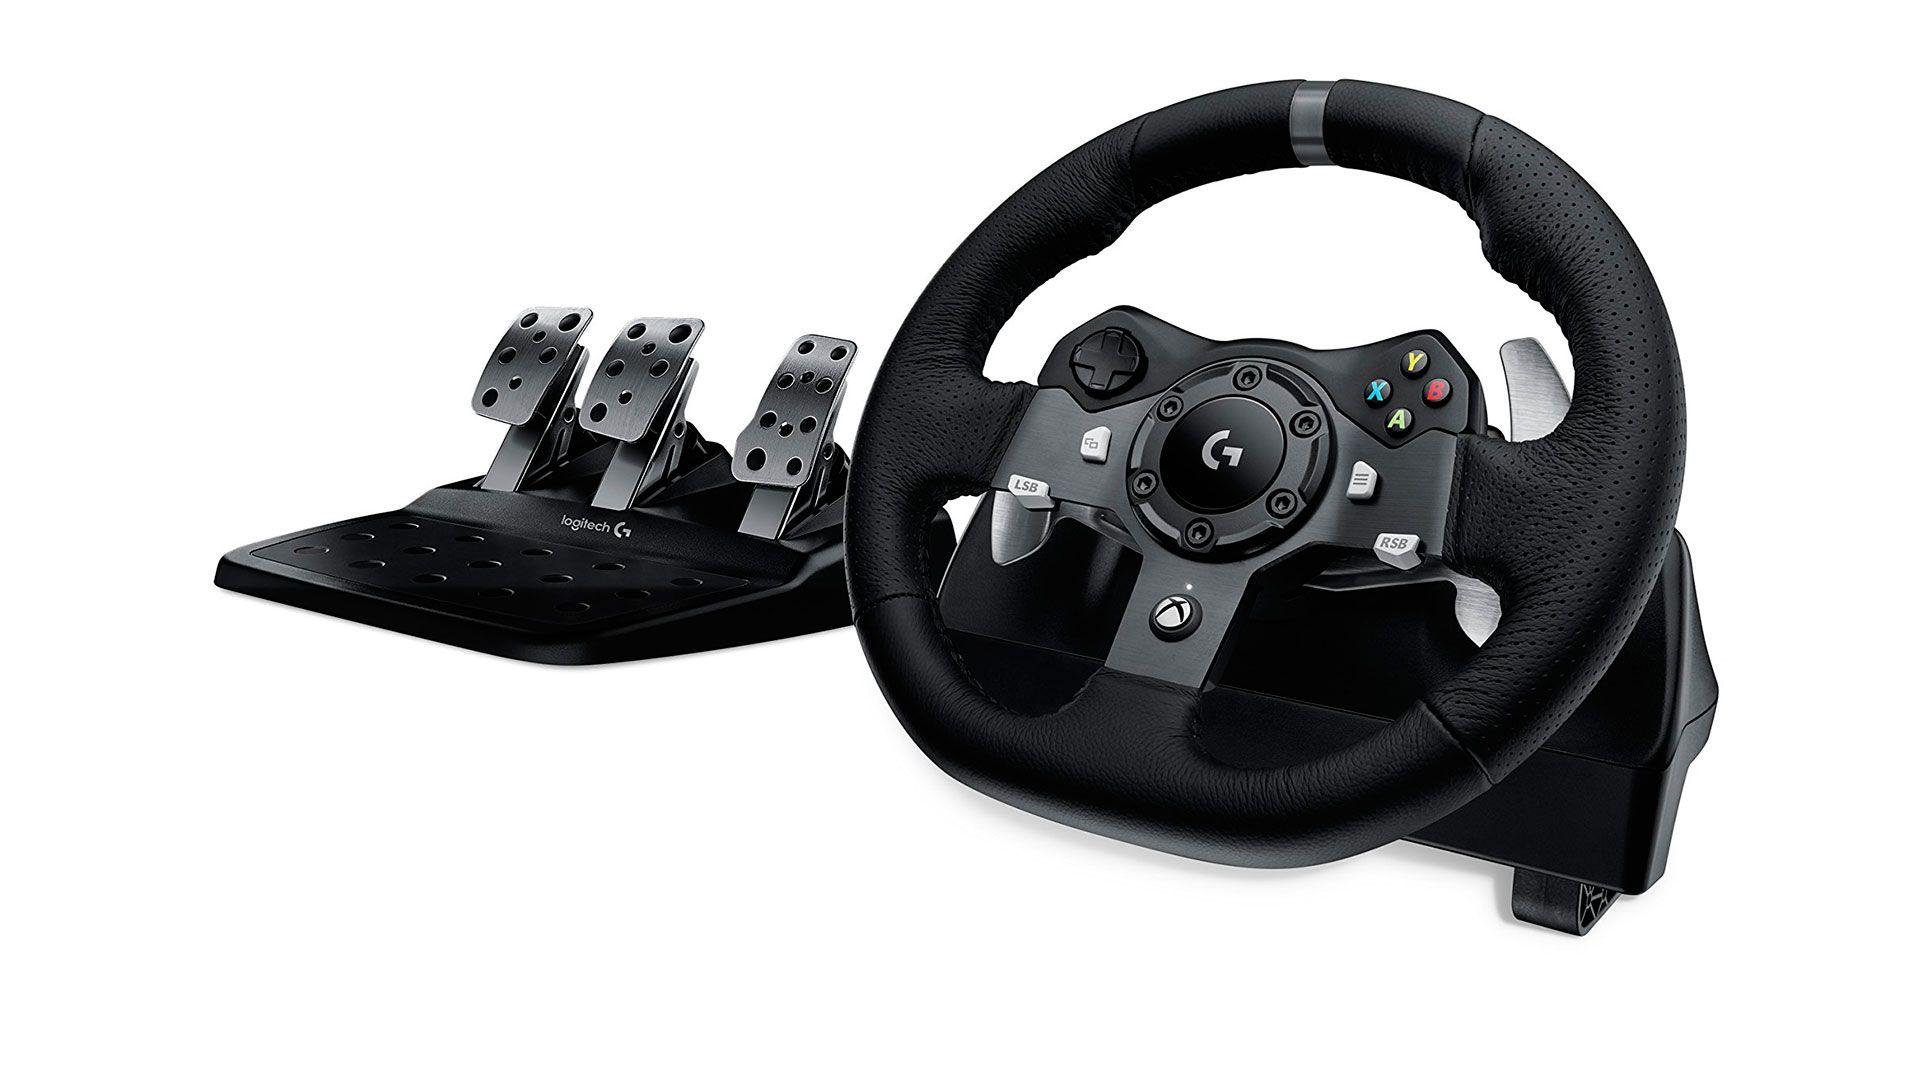 Logitech G920 Driving Force игровой руль для Xbox One